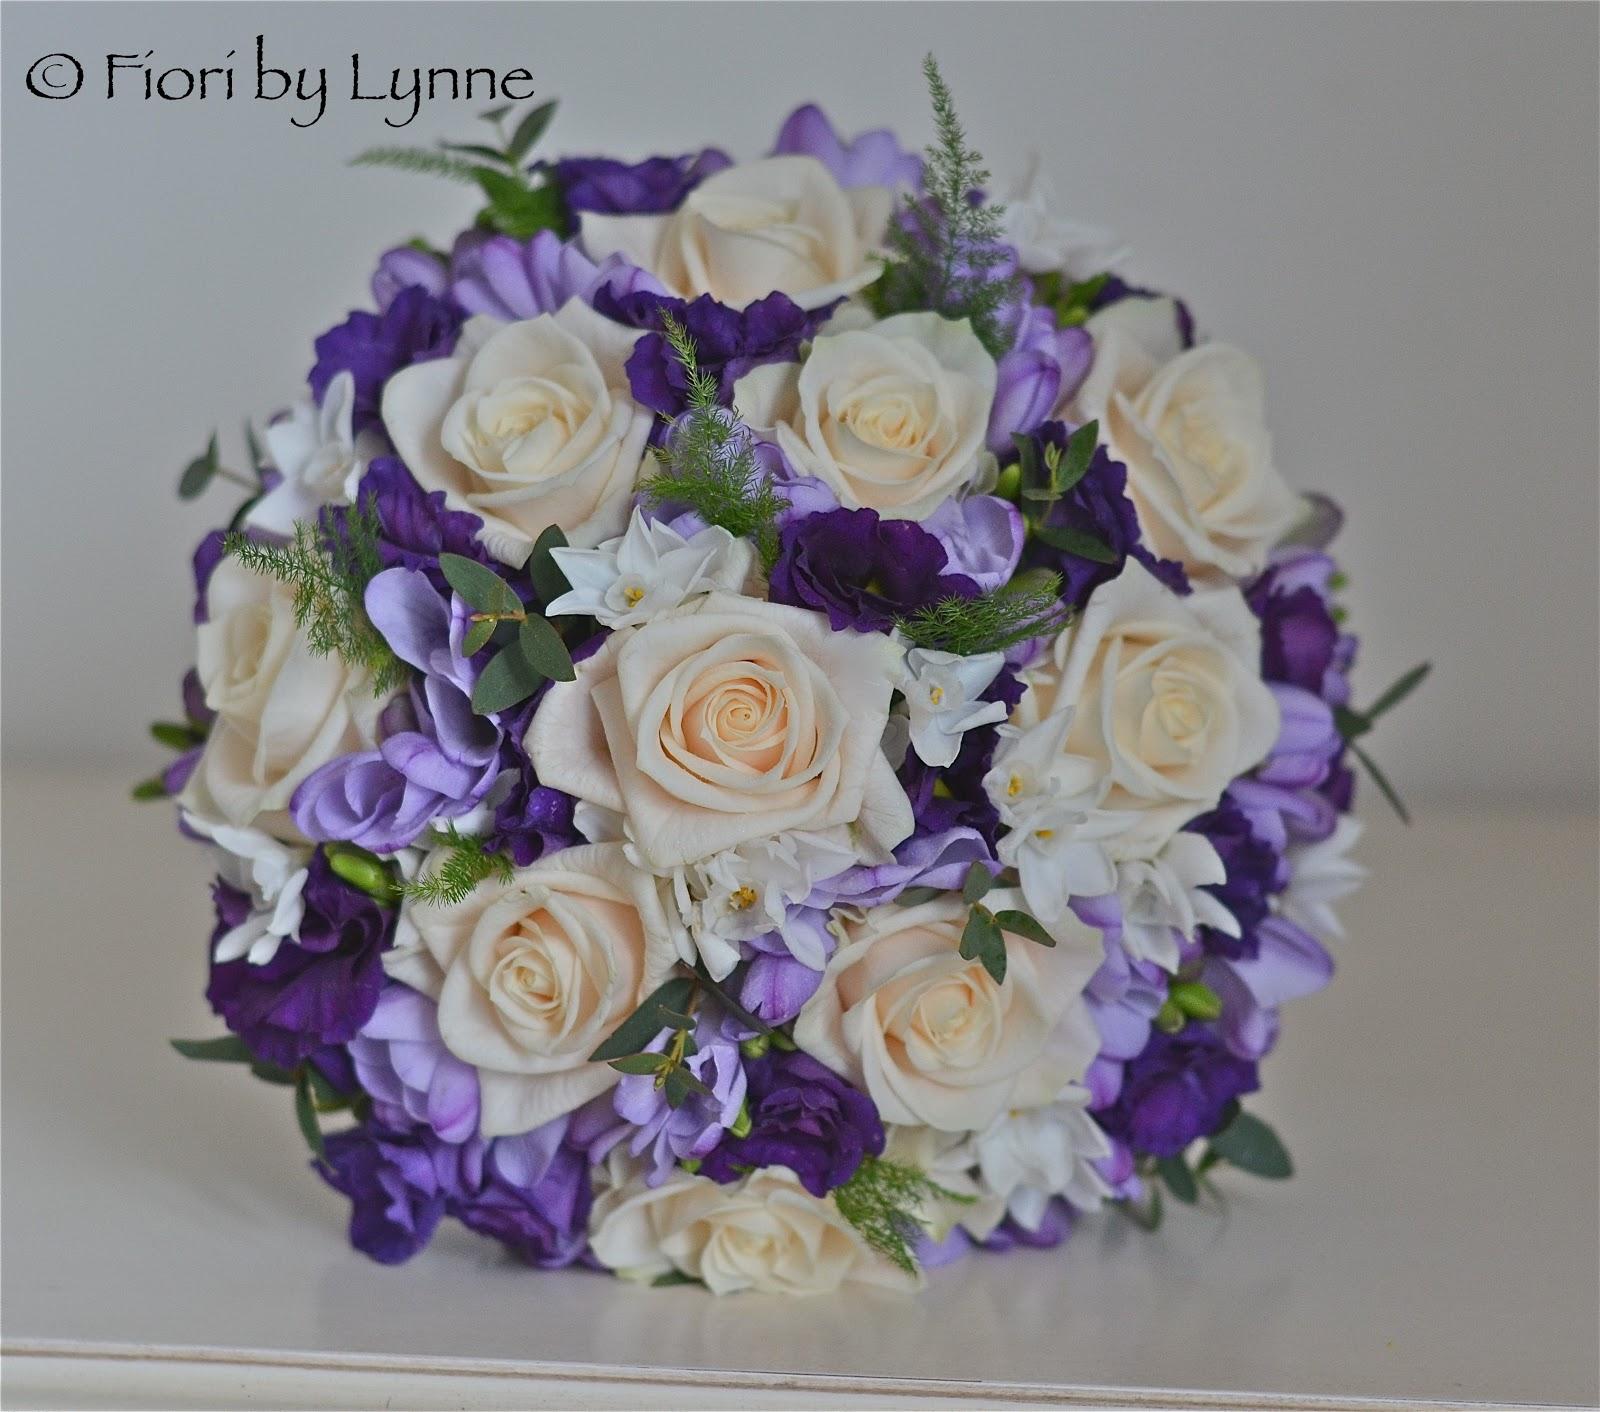 Lavender Wedding Favors: Wedding Flowers Blog: March 2013